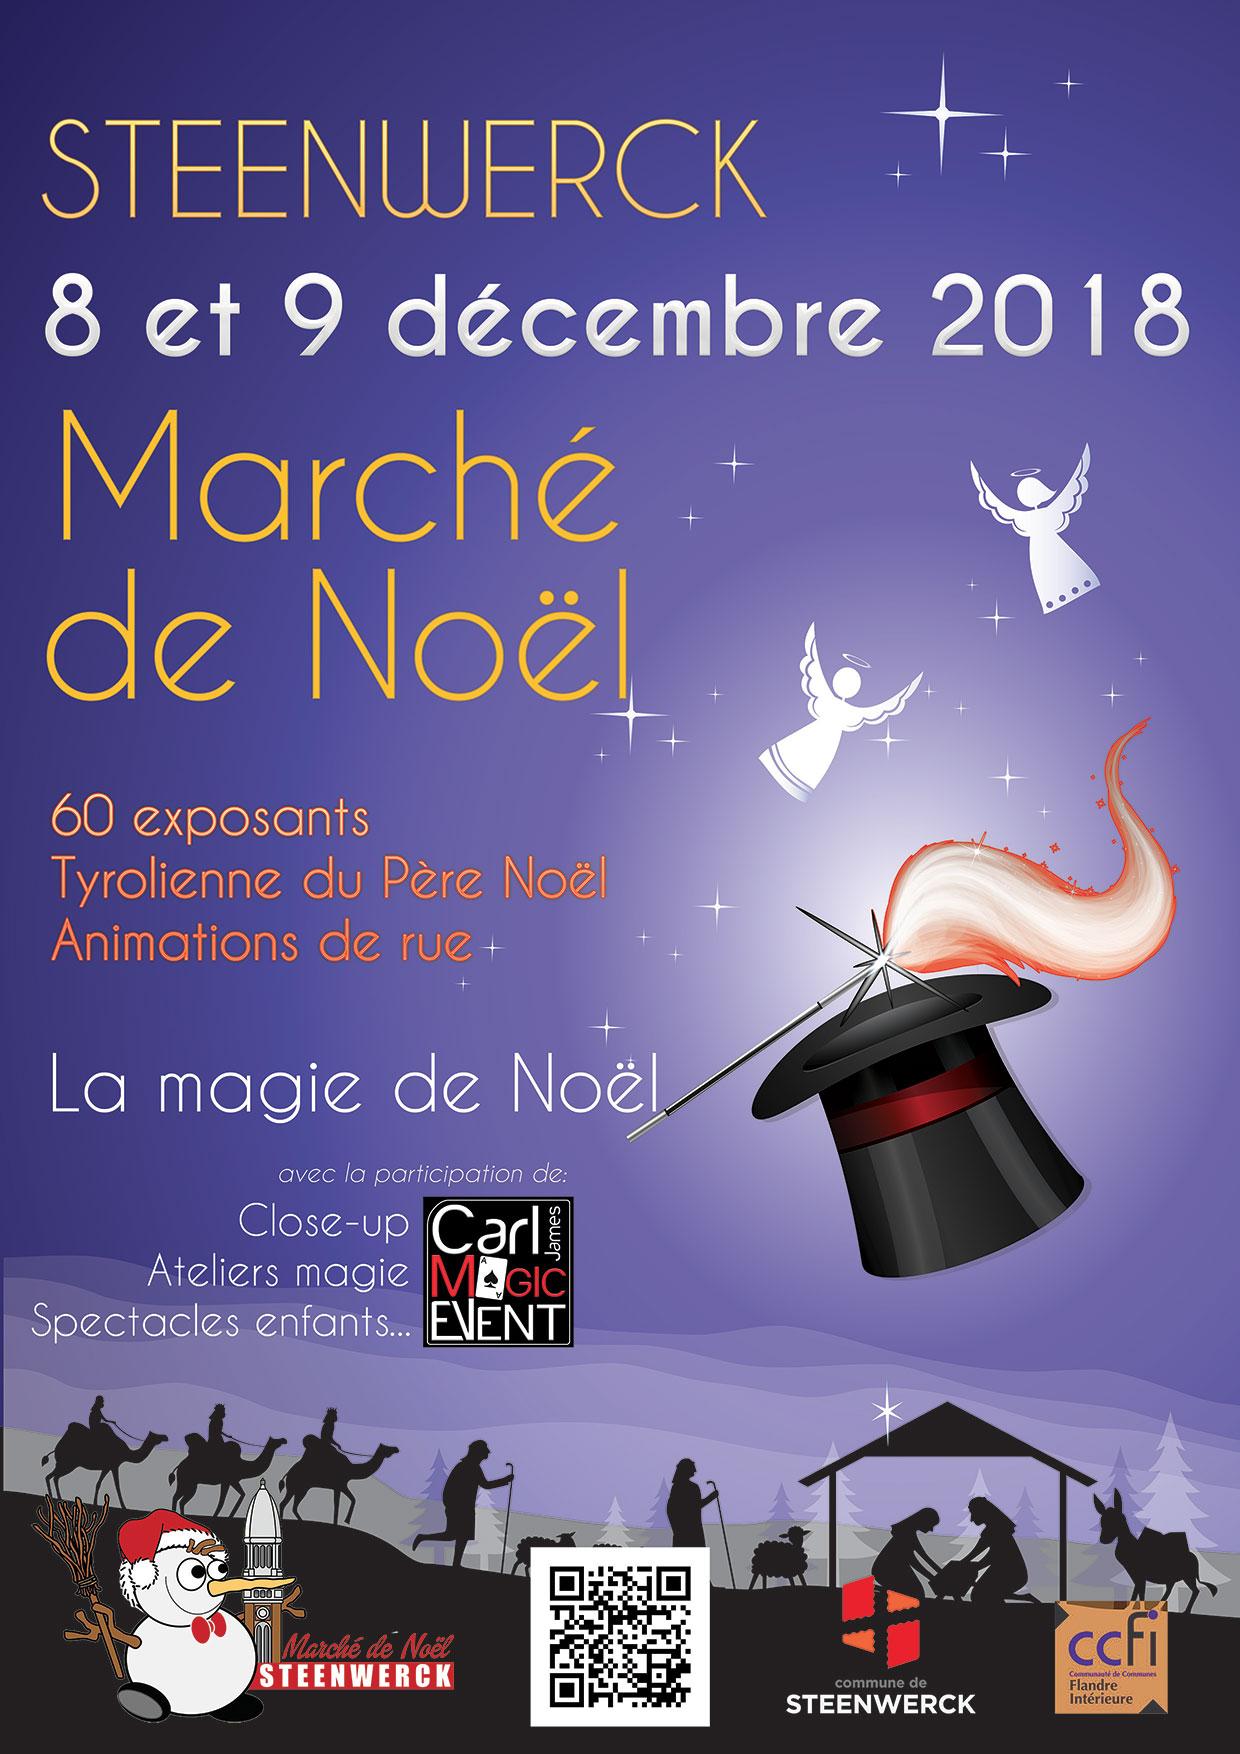 marché de noel 2018 nord MARCHE DE NOEL DE STEENWERCK marché de noel 2018 nord